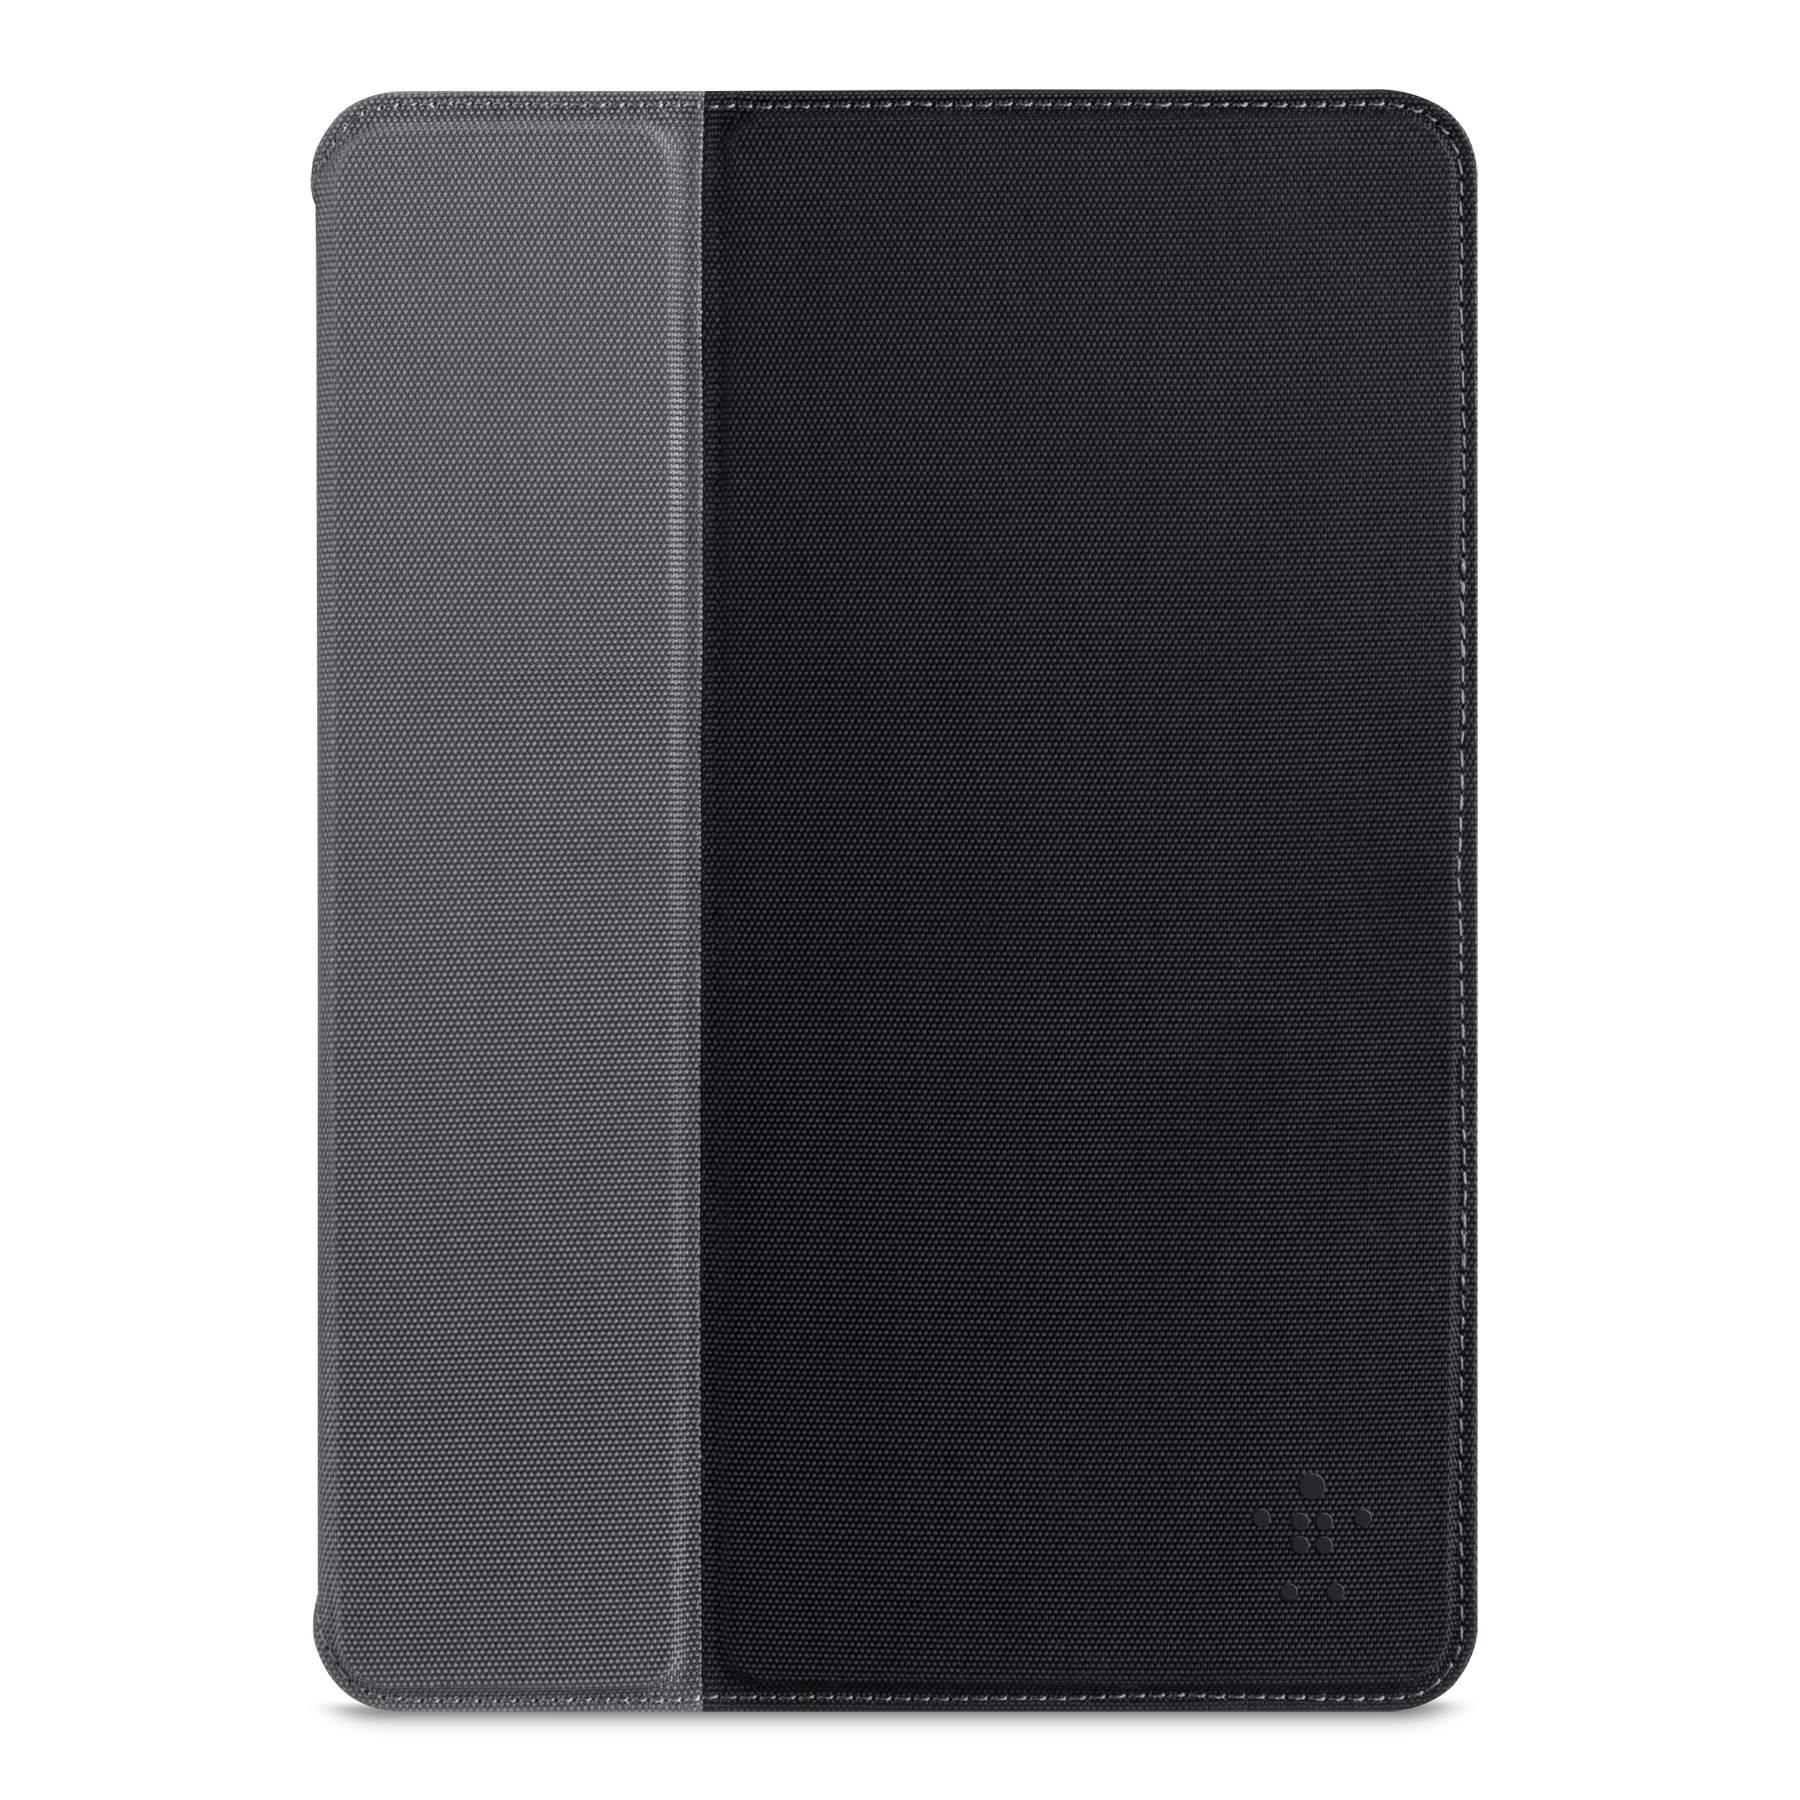 Belkin FormFit Cover / Case for iPad Air (iPad 5) (Blacktop)